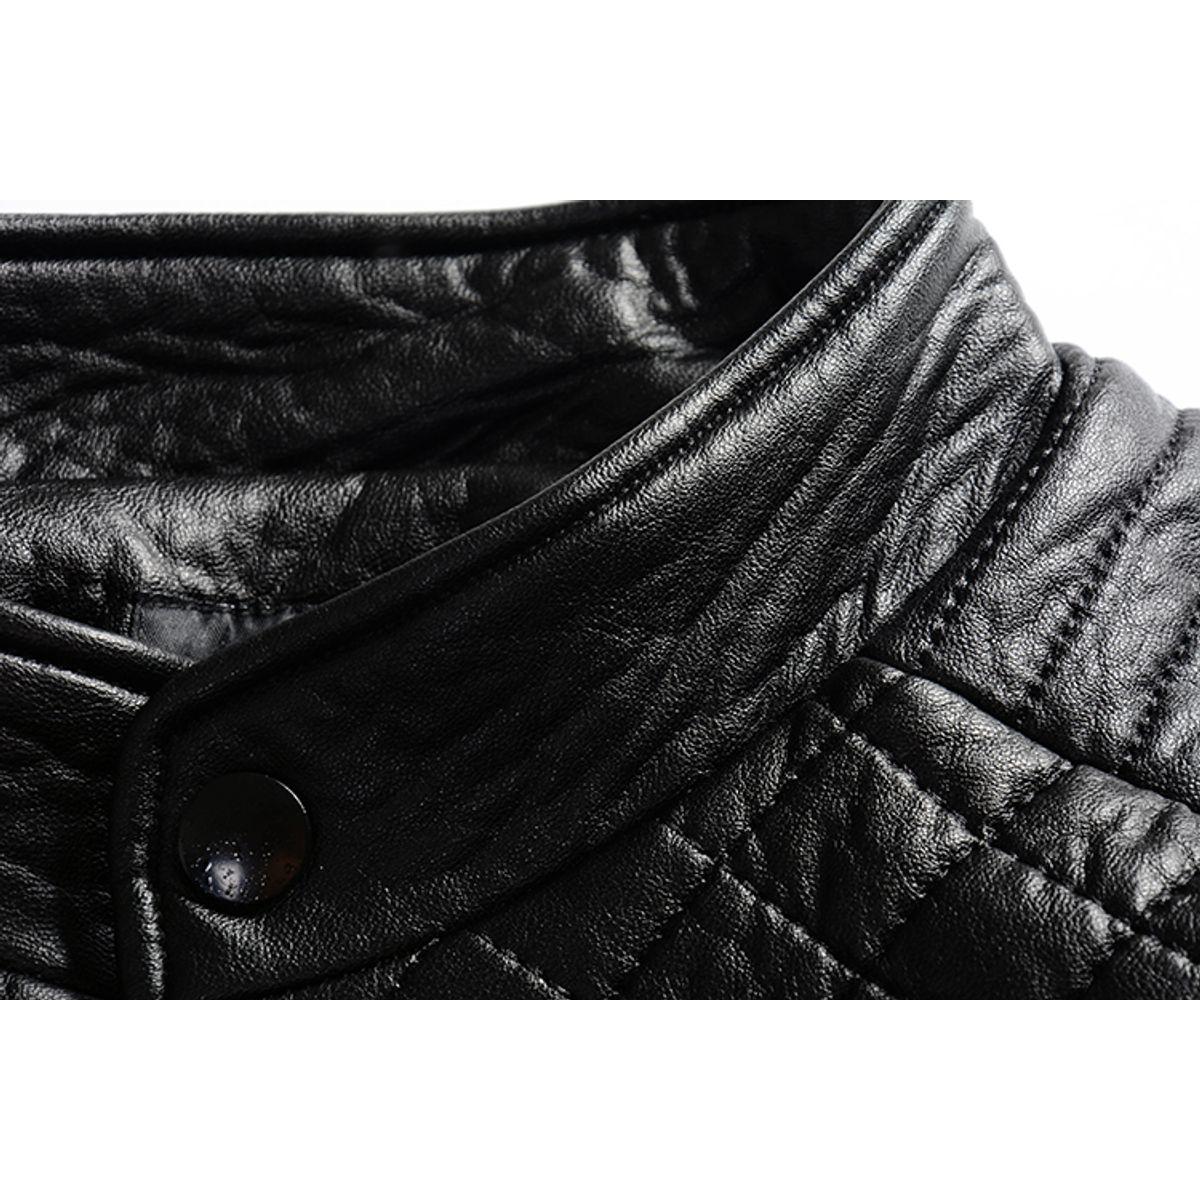 T25 - Italiano TUCCI Vintage Slim Fit Padding Style Designer Mens Pure Leather Jacket